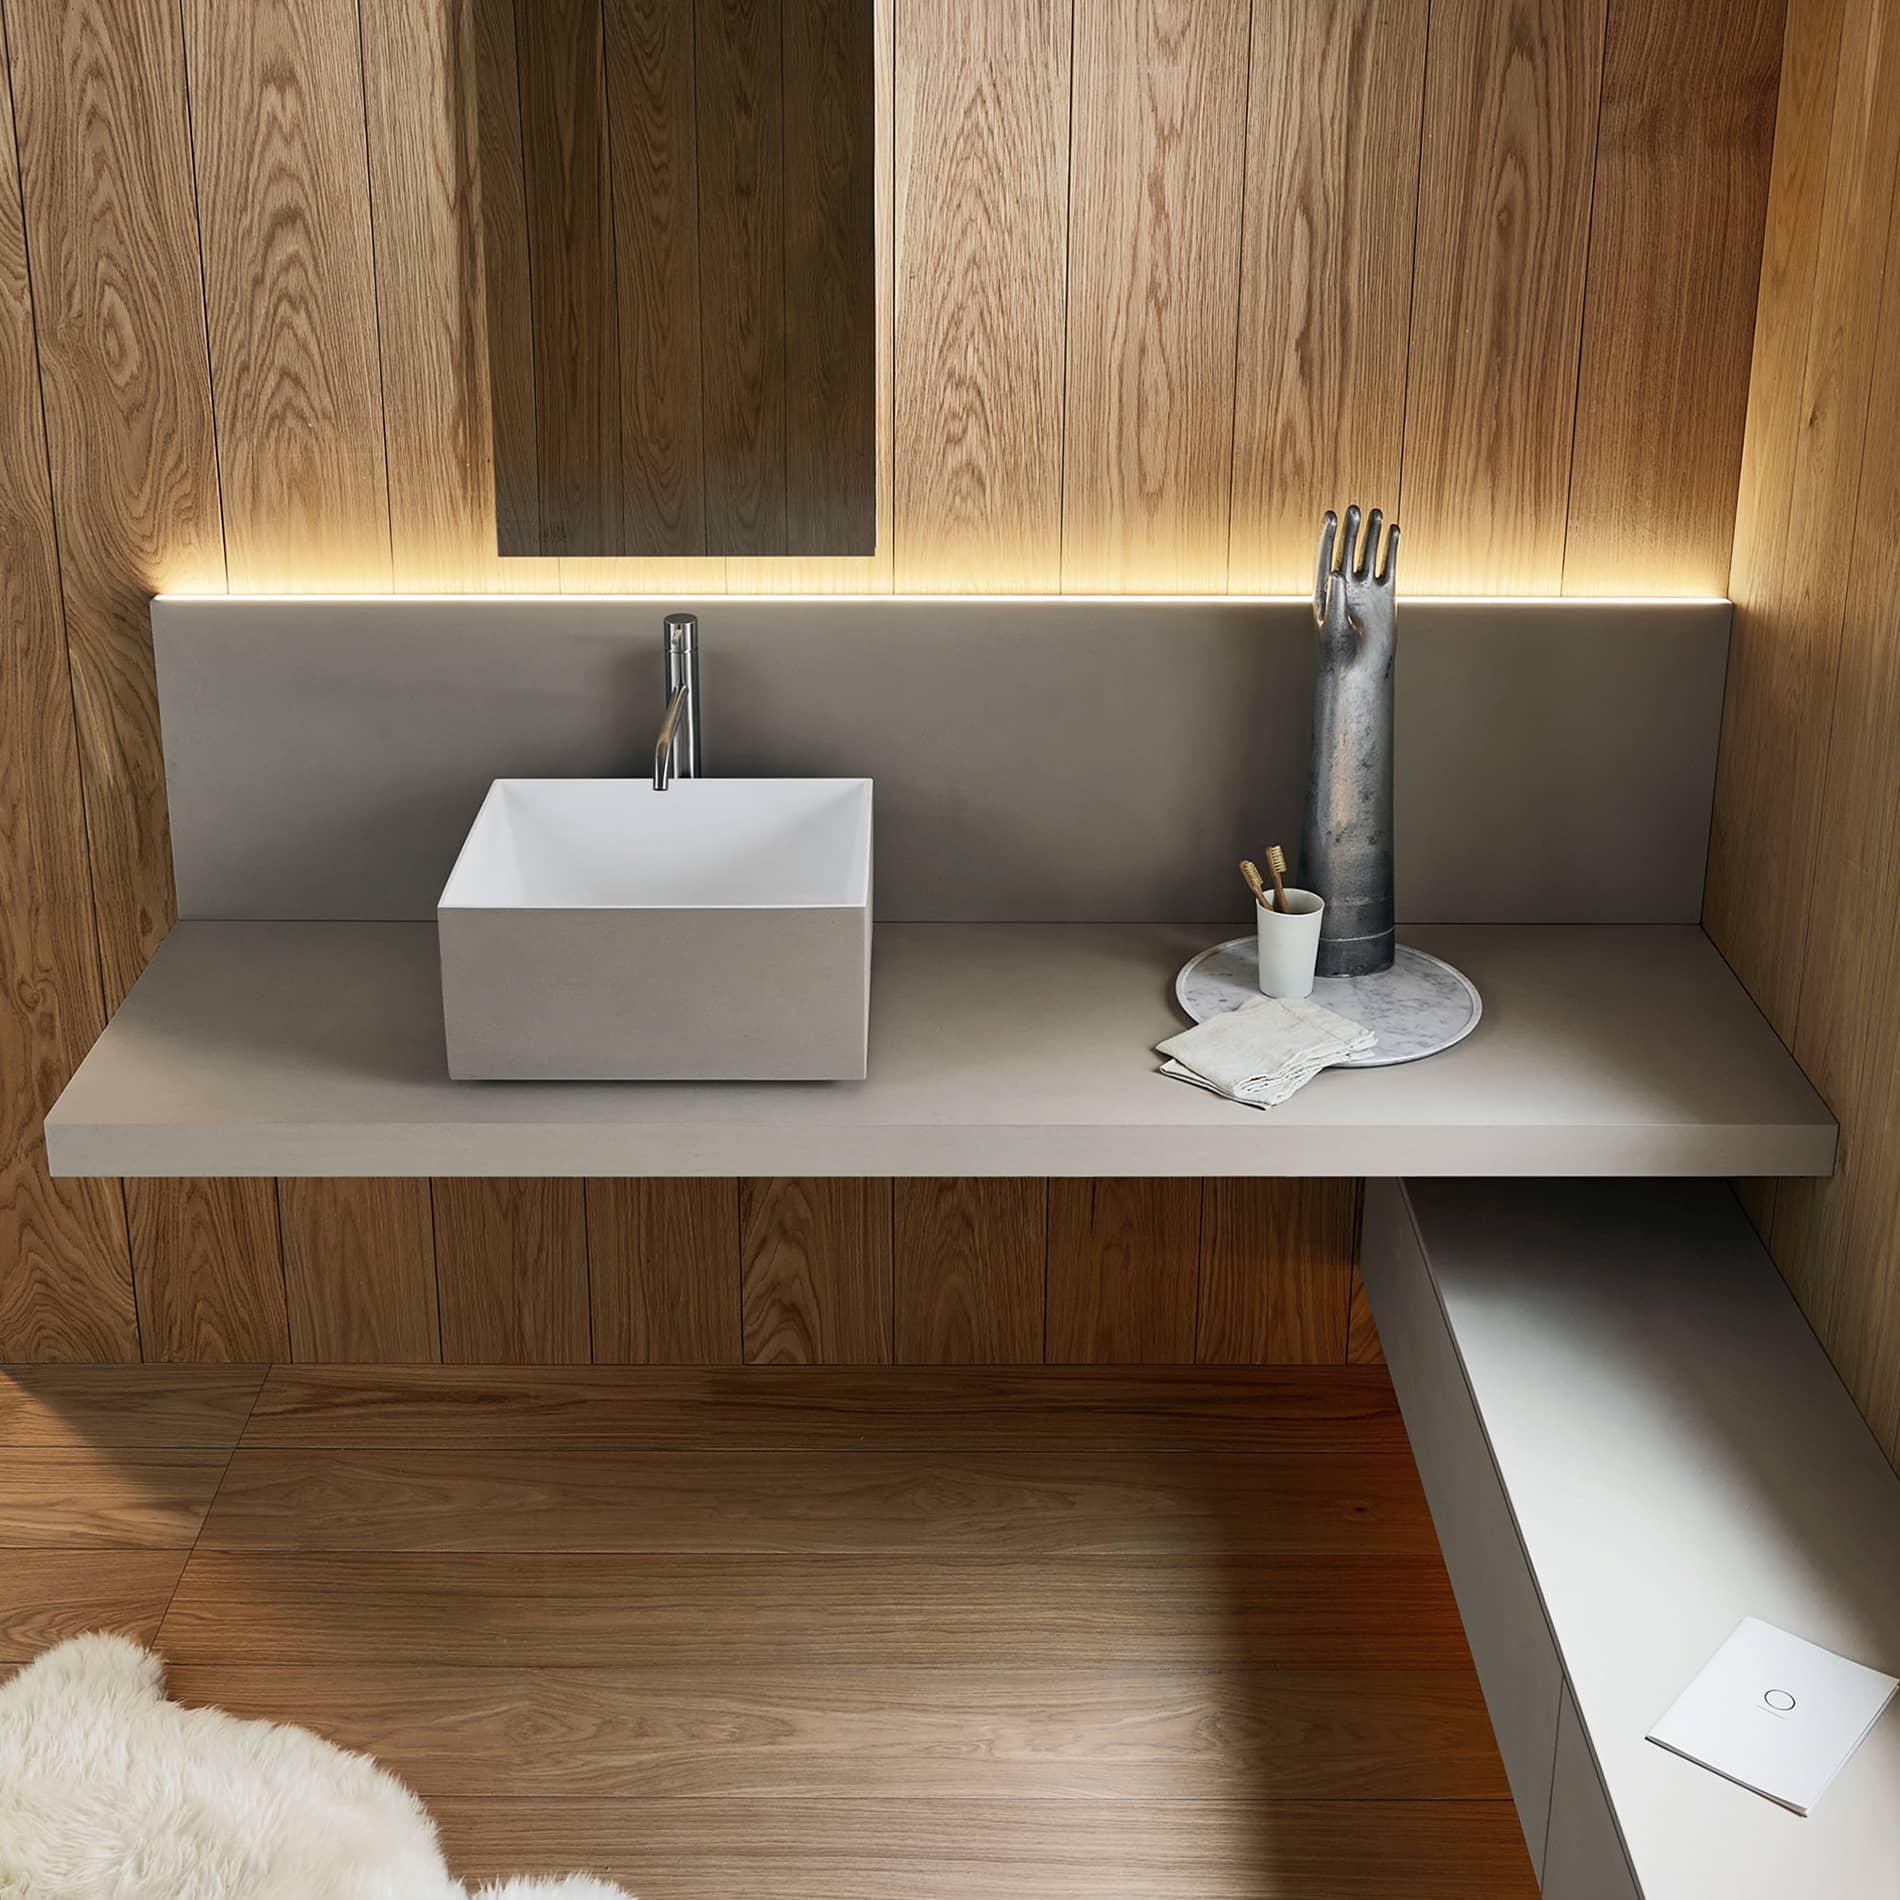 Cristalplant-products-Milldue-washbasins-2